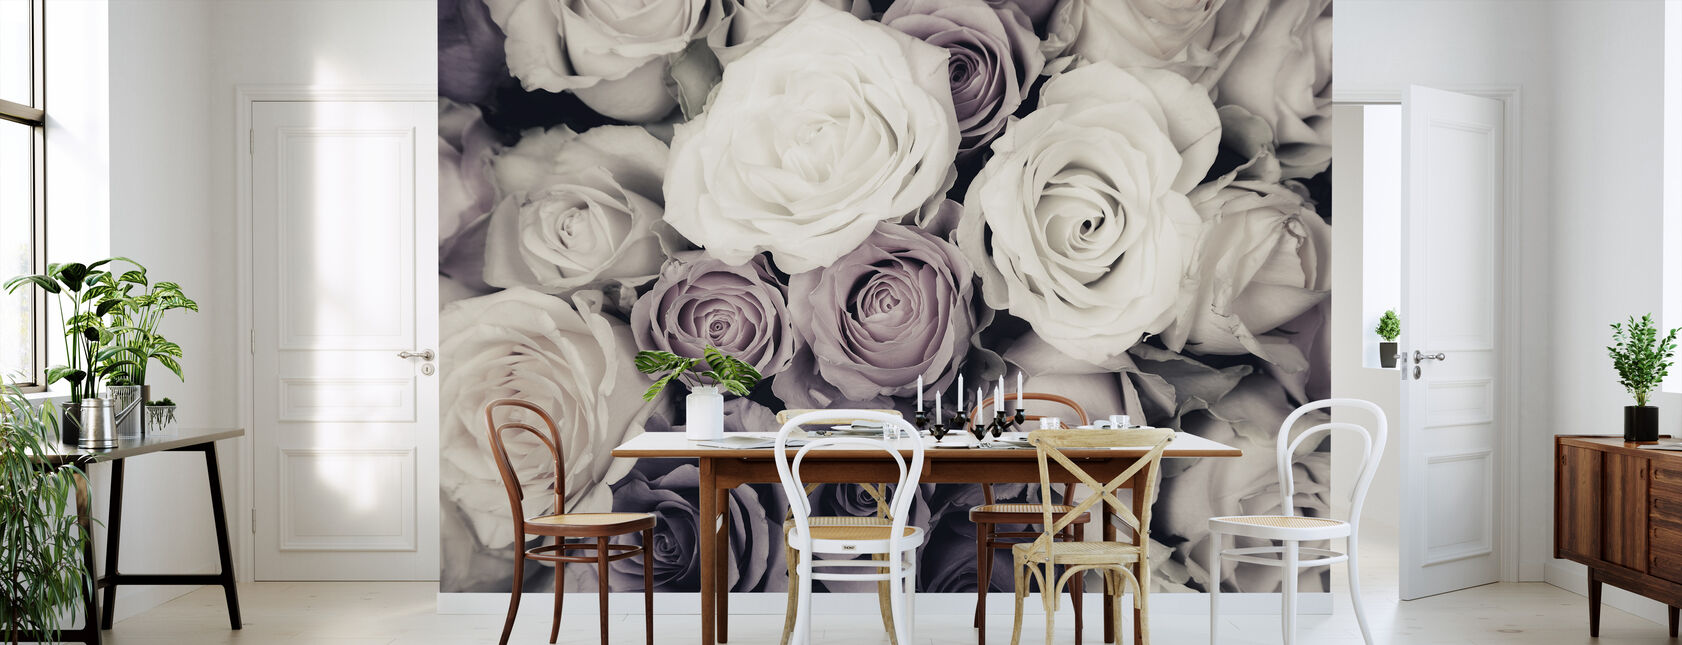 Mörka rosor - Tapet - Kök